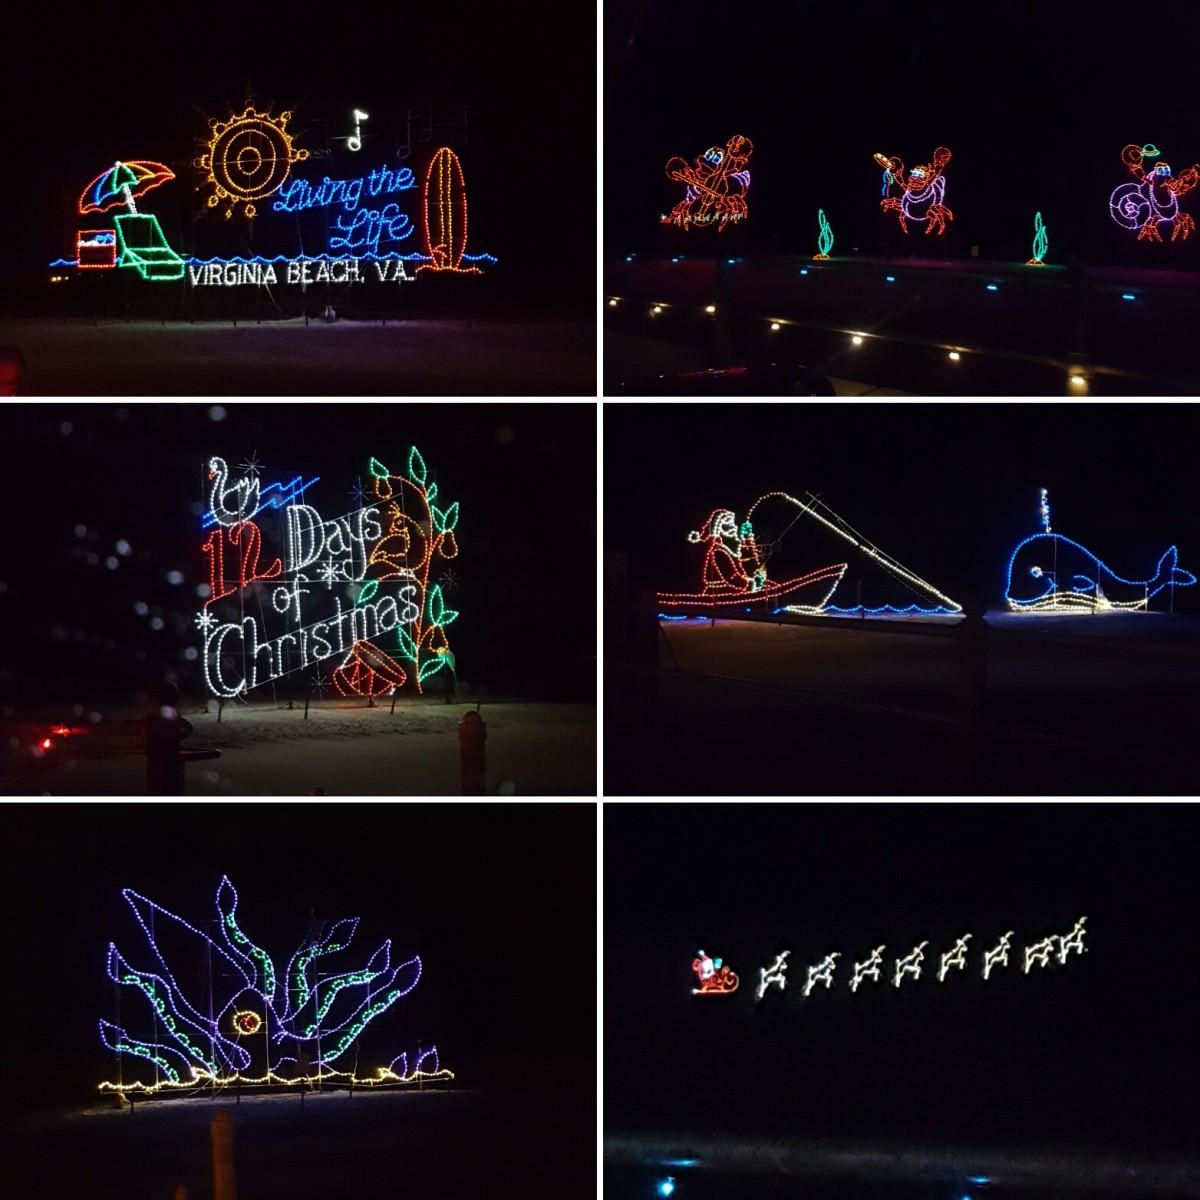 McDonald's Holiday Lights at the Beach, Virginia Beach